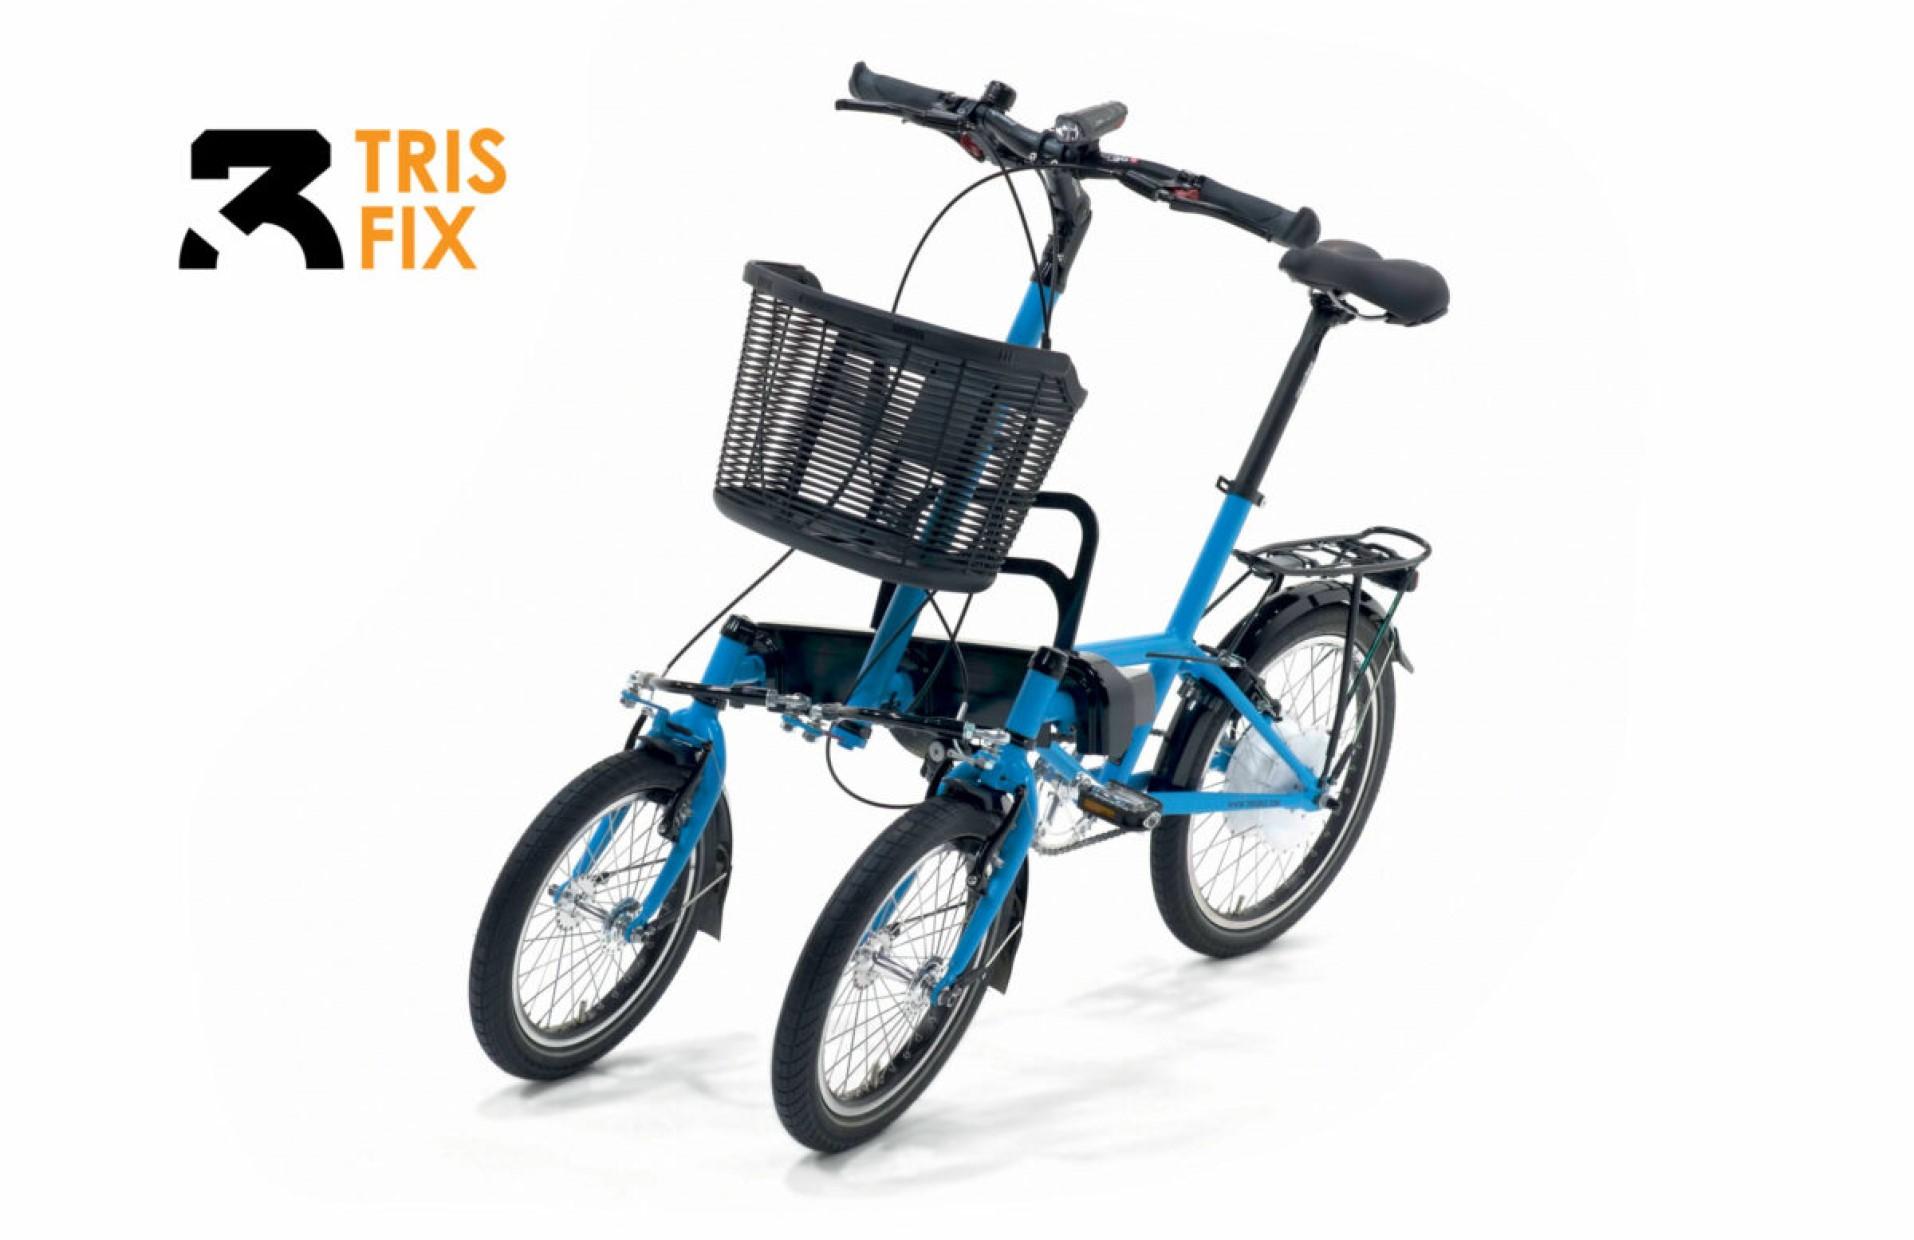 Leaning e-trike